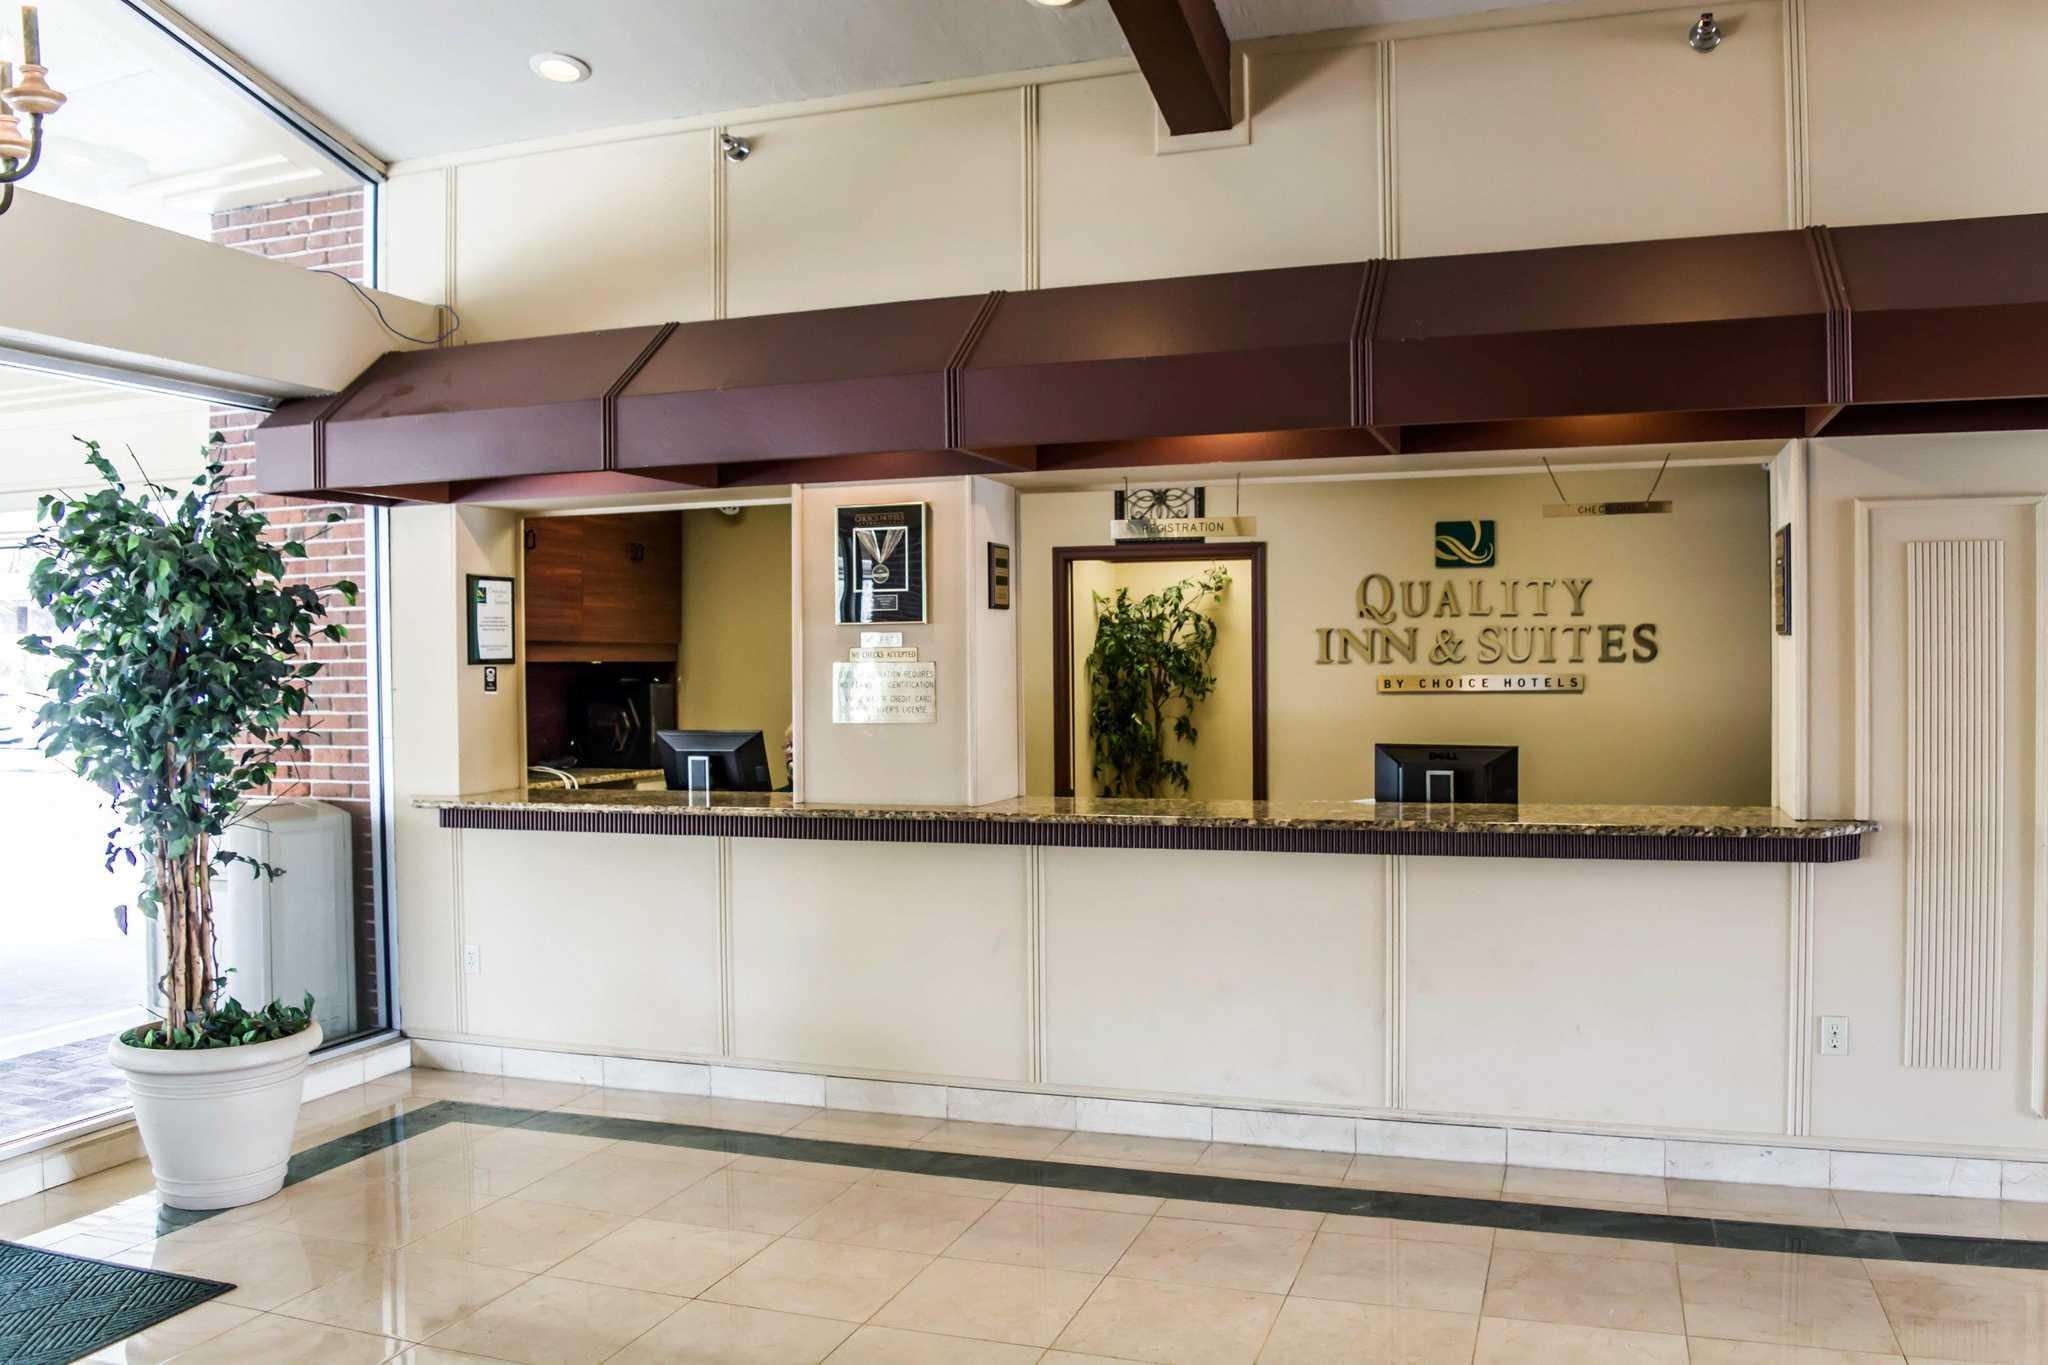 Quality Inn & Suites Golf Resort image 15